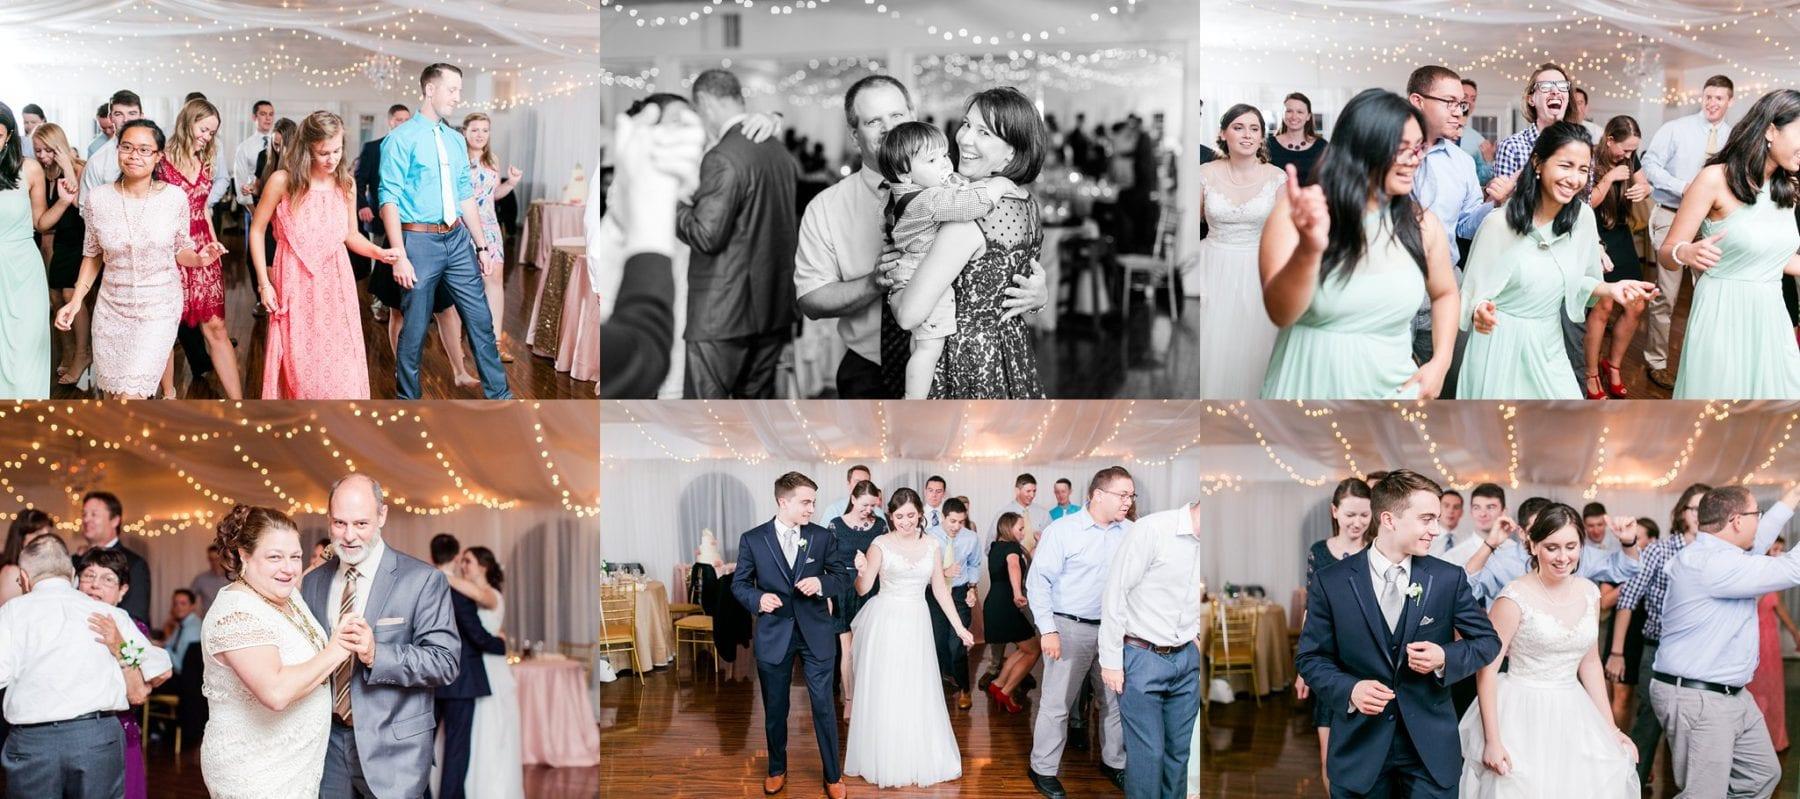 Bristow Manor Wedding Photos Virginia Wedding Photographer Lauren & Andrew Megan Kelsey Photography-829.jpg